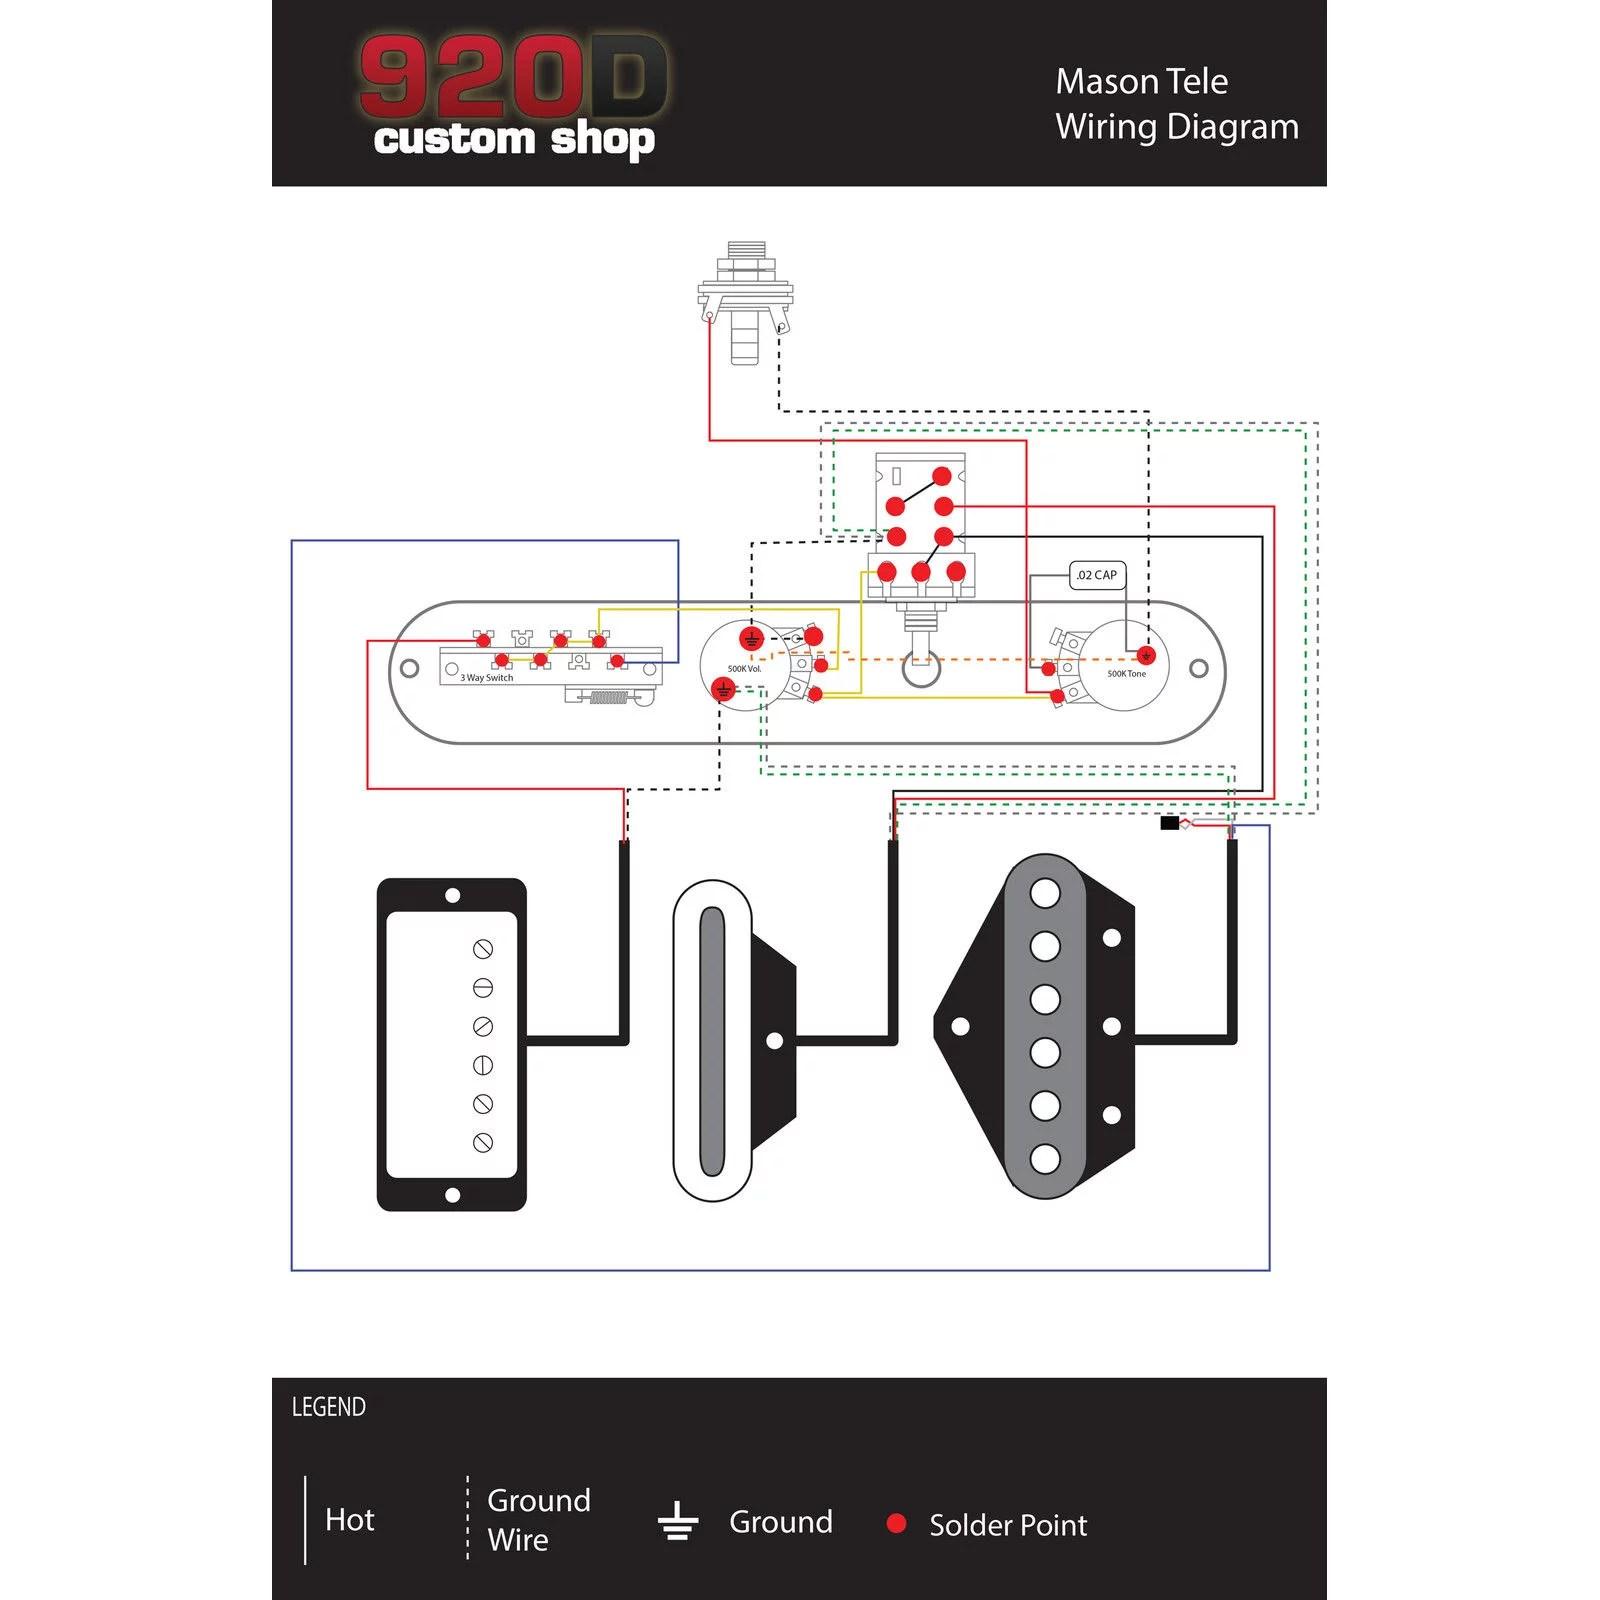 920d fender telecaster tele brent mason style 3 w control plate fender wiring diagrams 920d fender [ 1600 x 1600 Pixel ]